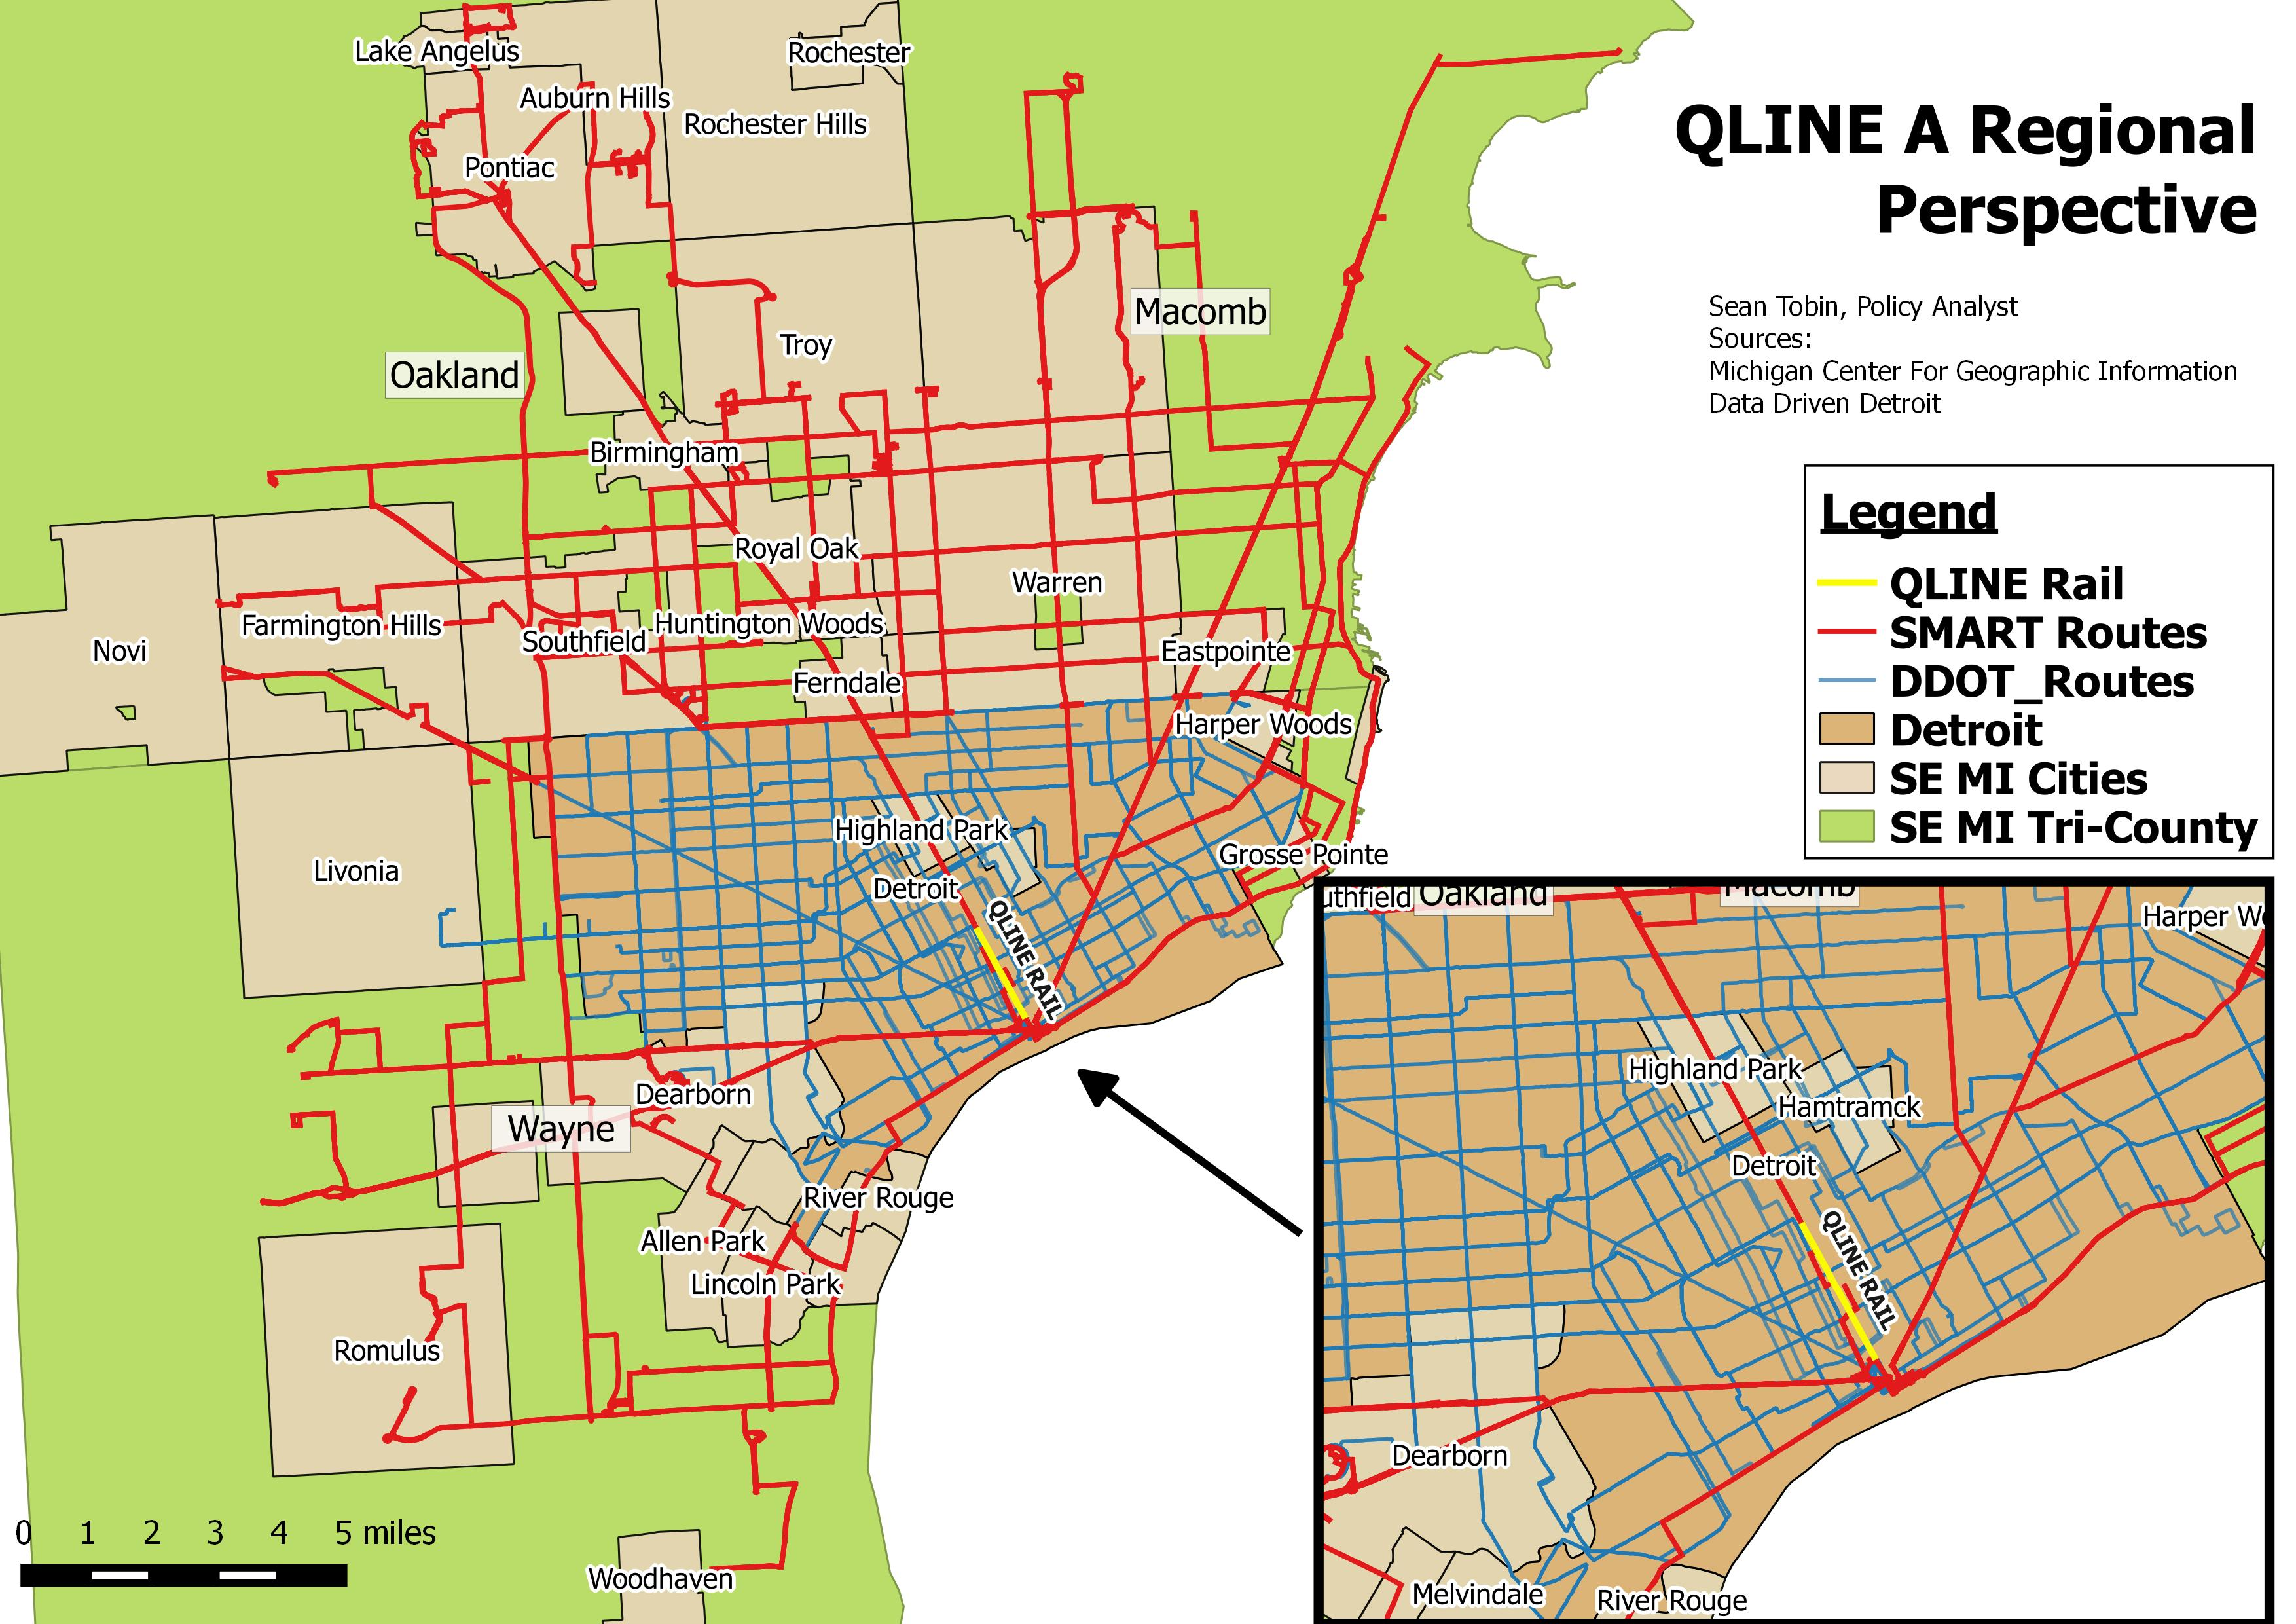 QLINE Regional Perspective